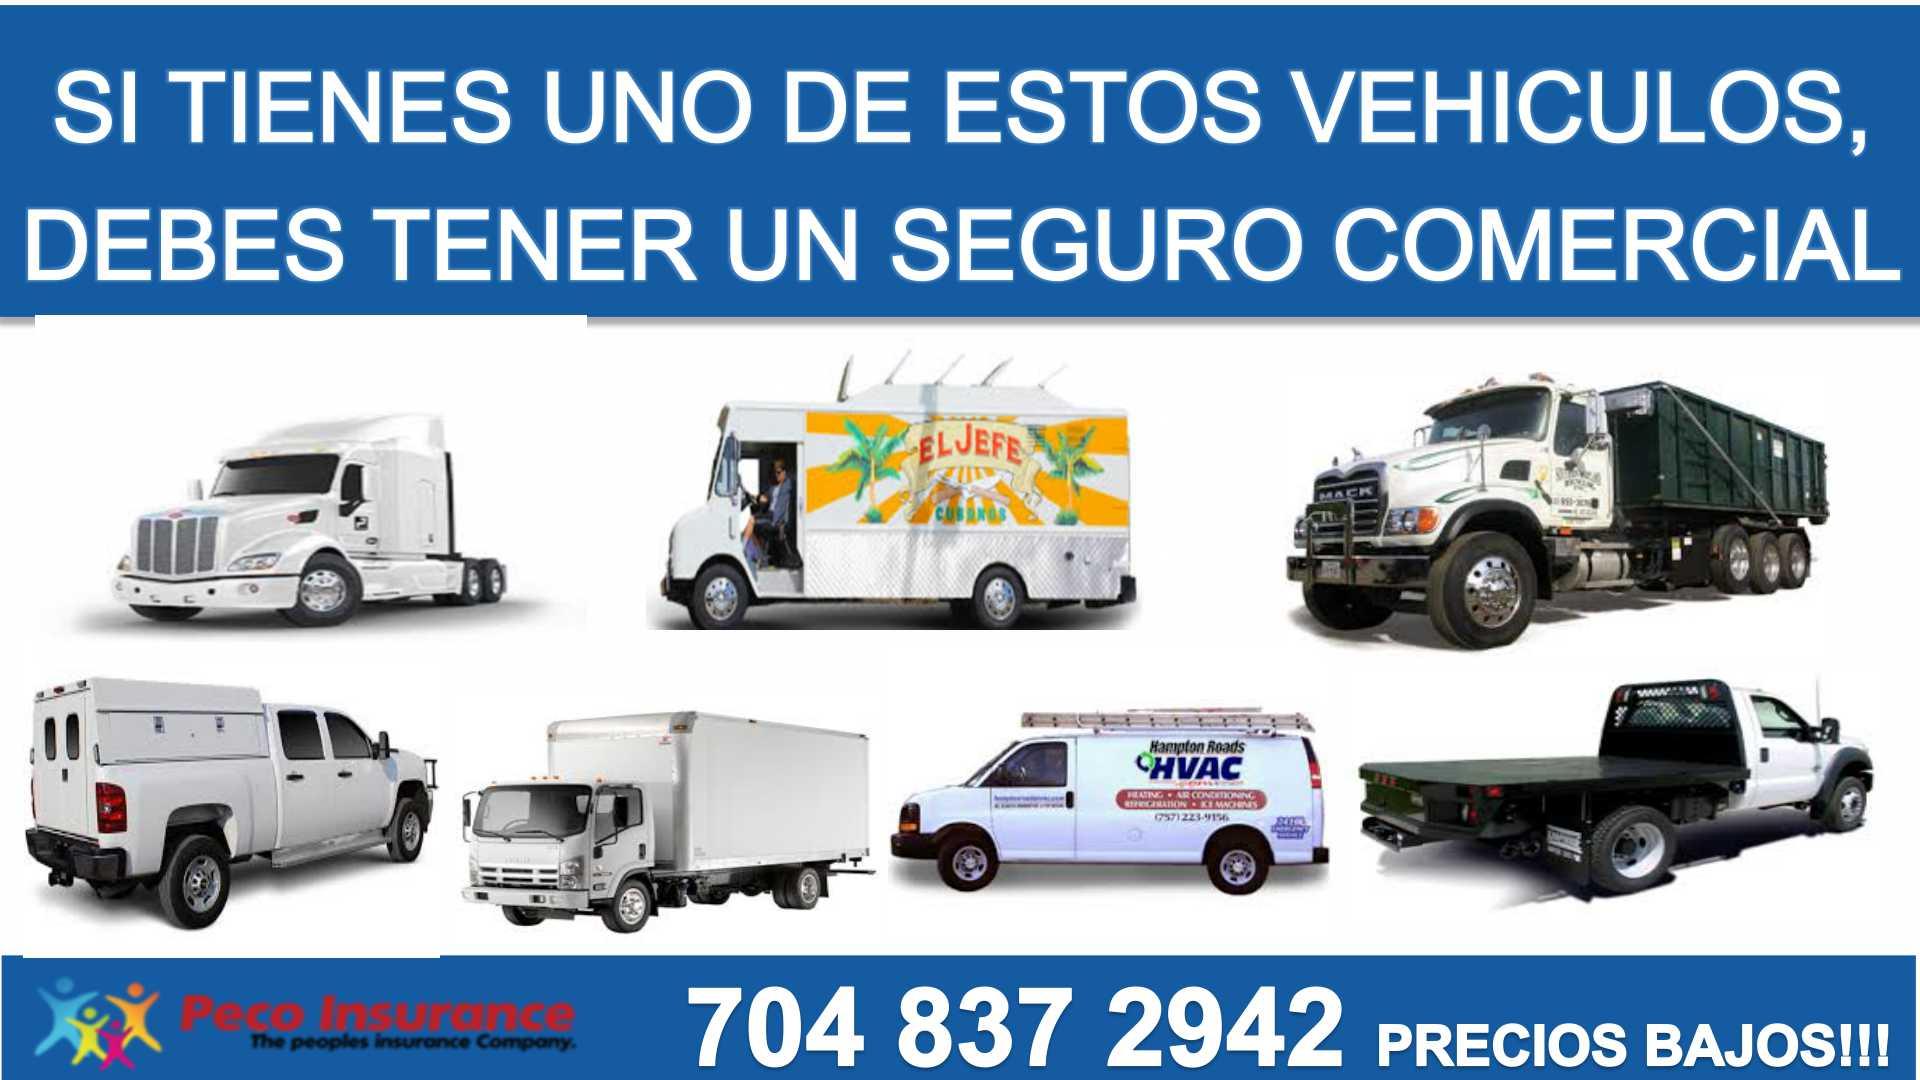 Peco Insurance image 5